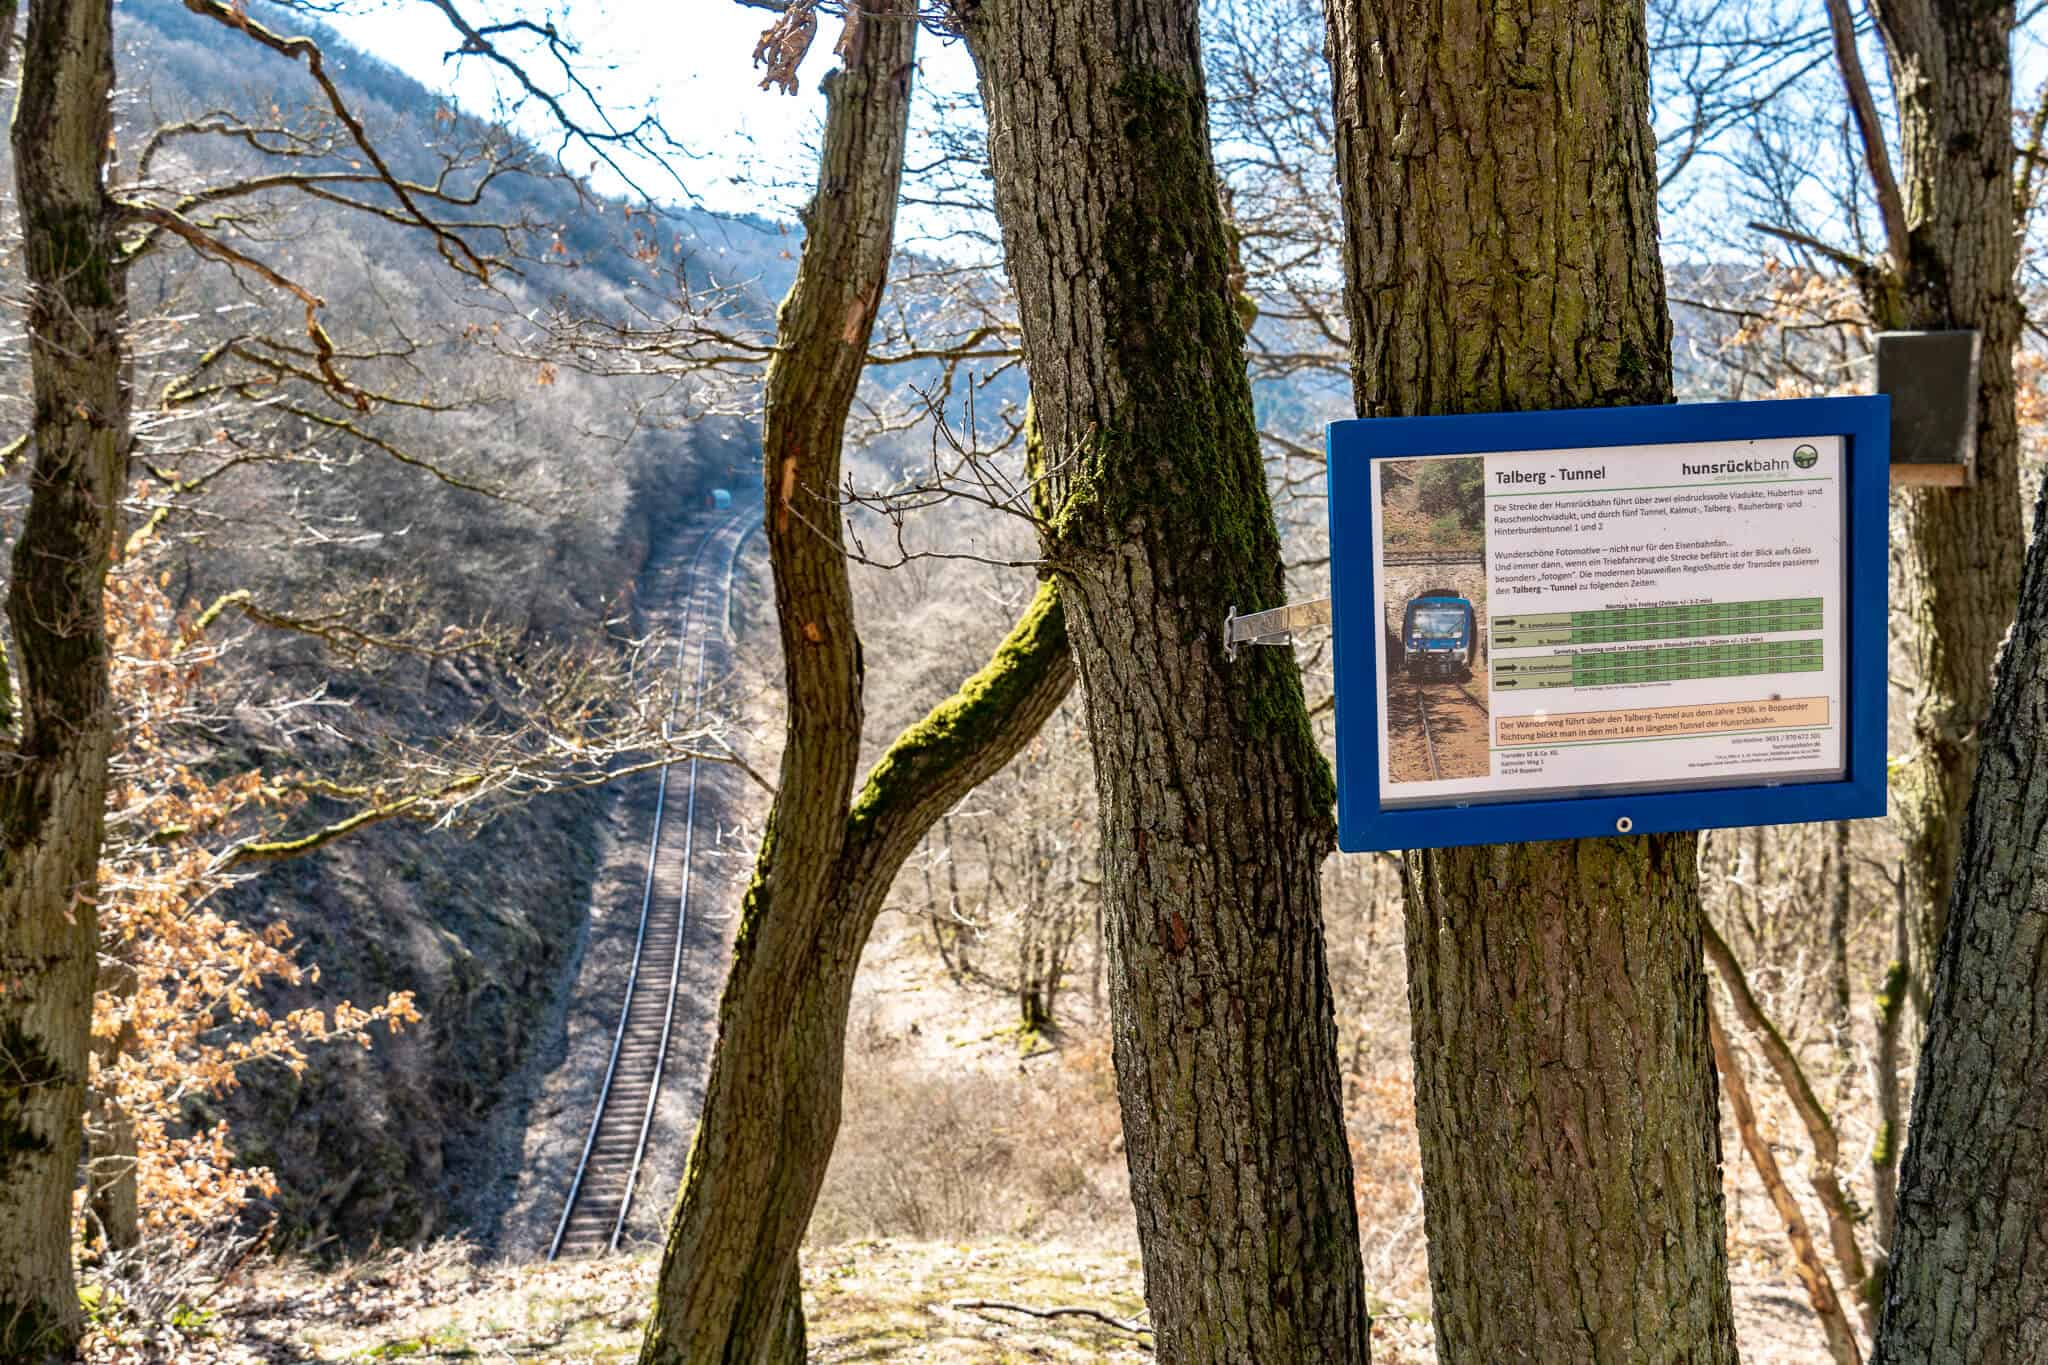 Fahrplan Hunsrückbahn Traumschleife Elfenlay